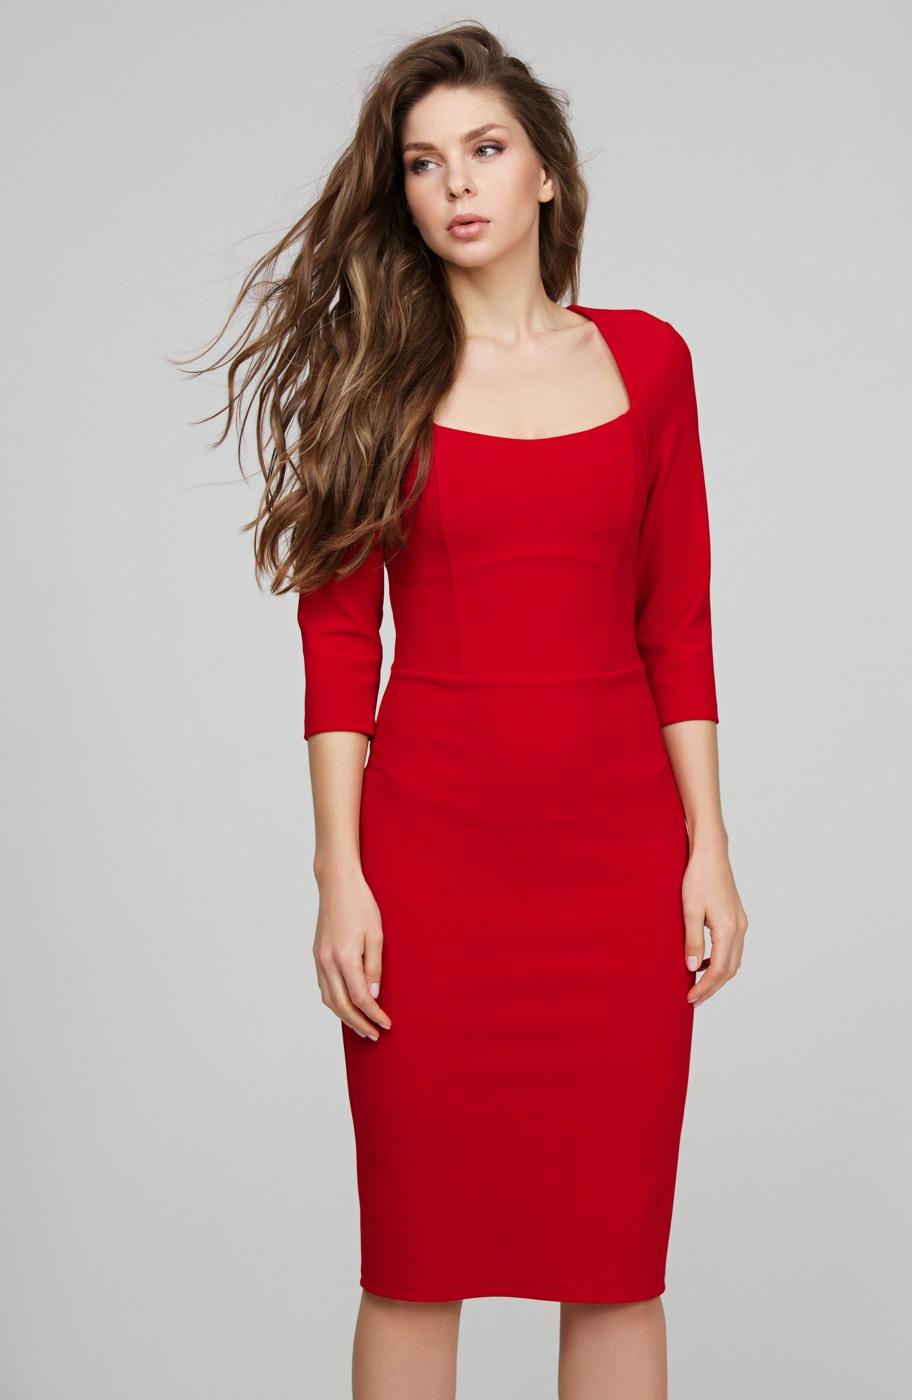 платье-футляр с рукавом три четверти